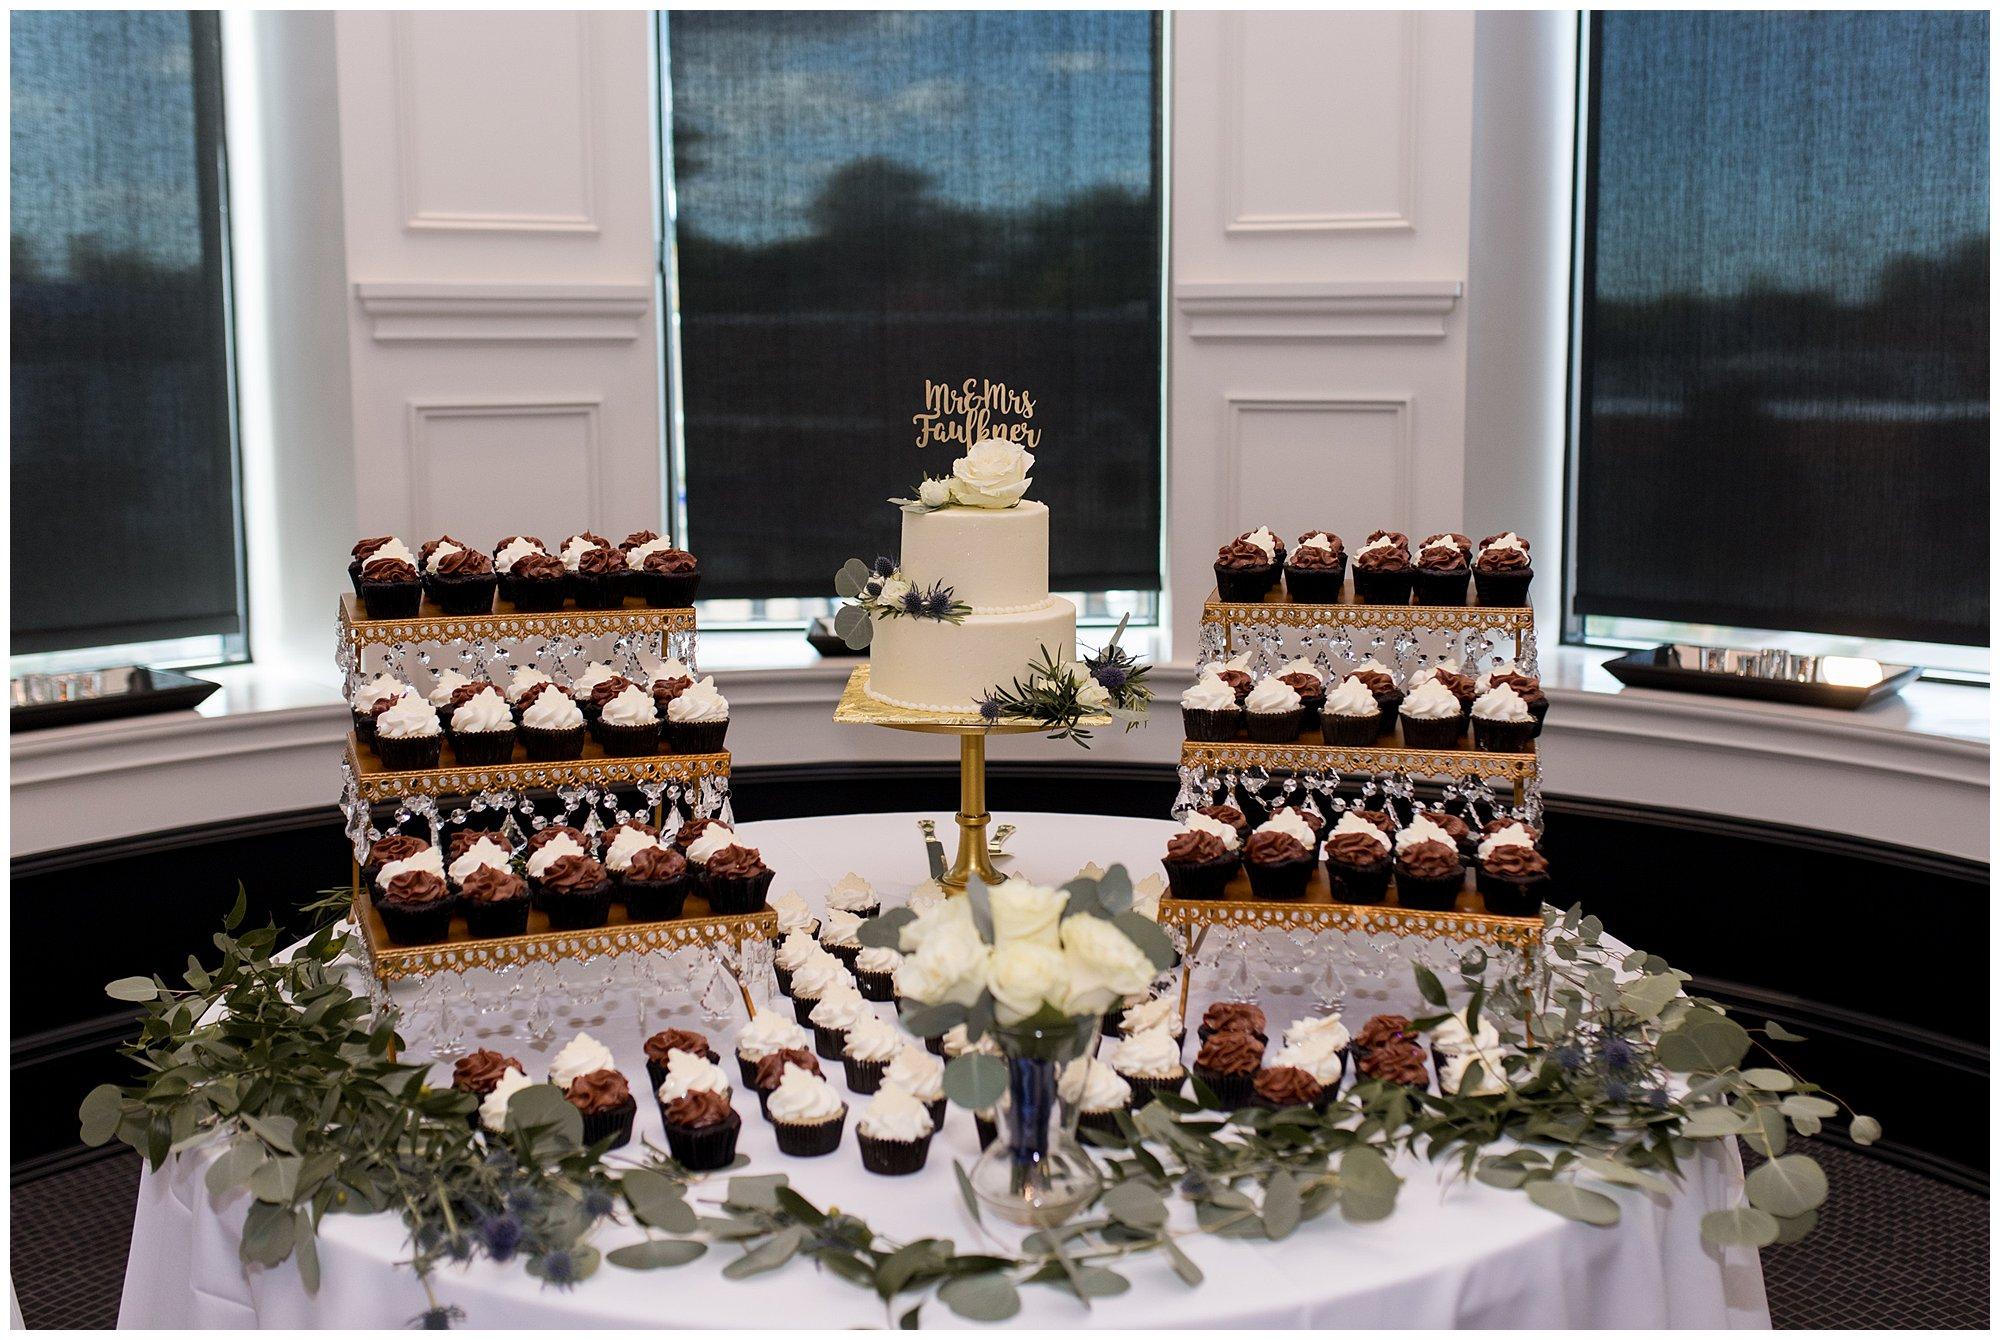 wedding cake and cupcakes at The Hobson Kokomo from J. Edwards Gourmet